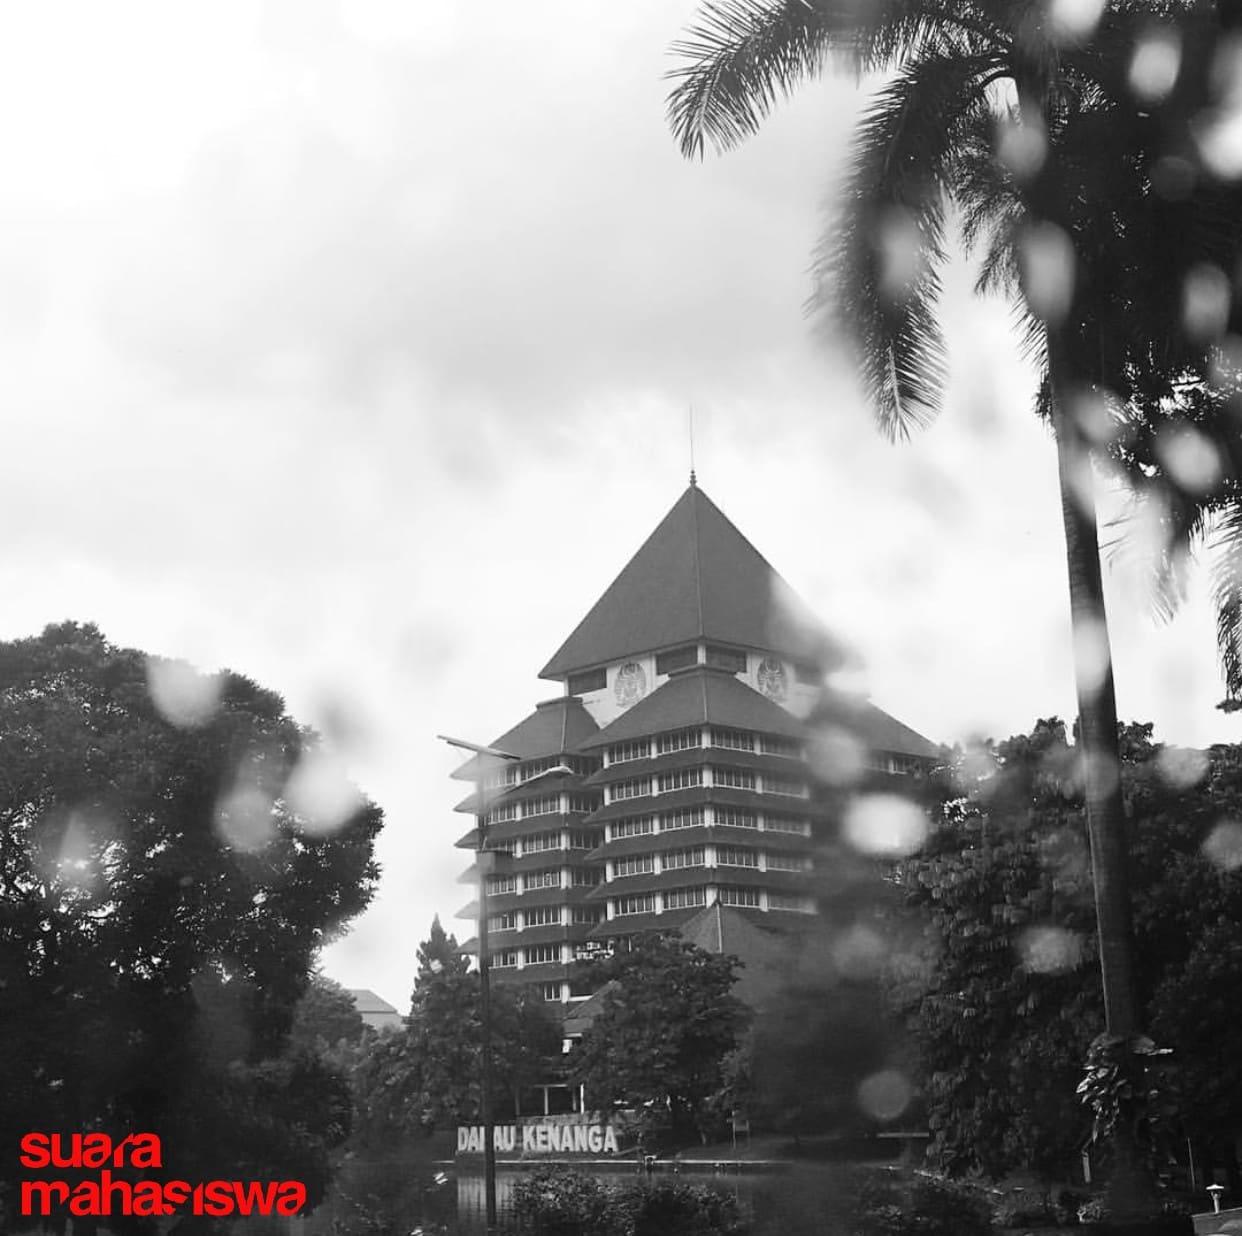 Kumpulan Suasana di Universitas Indonesia Sebelum Masa Pandemi